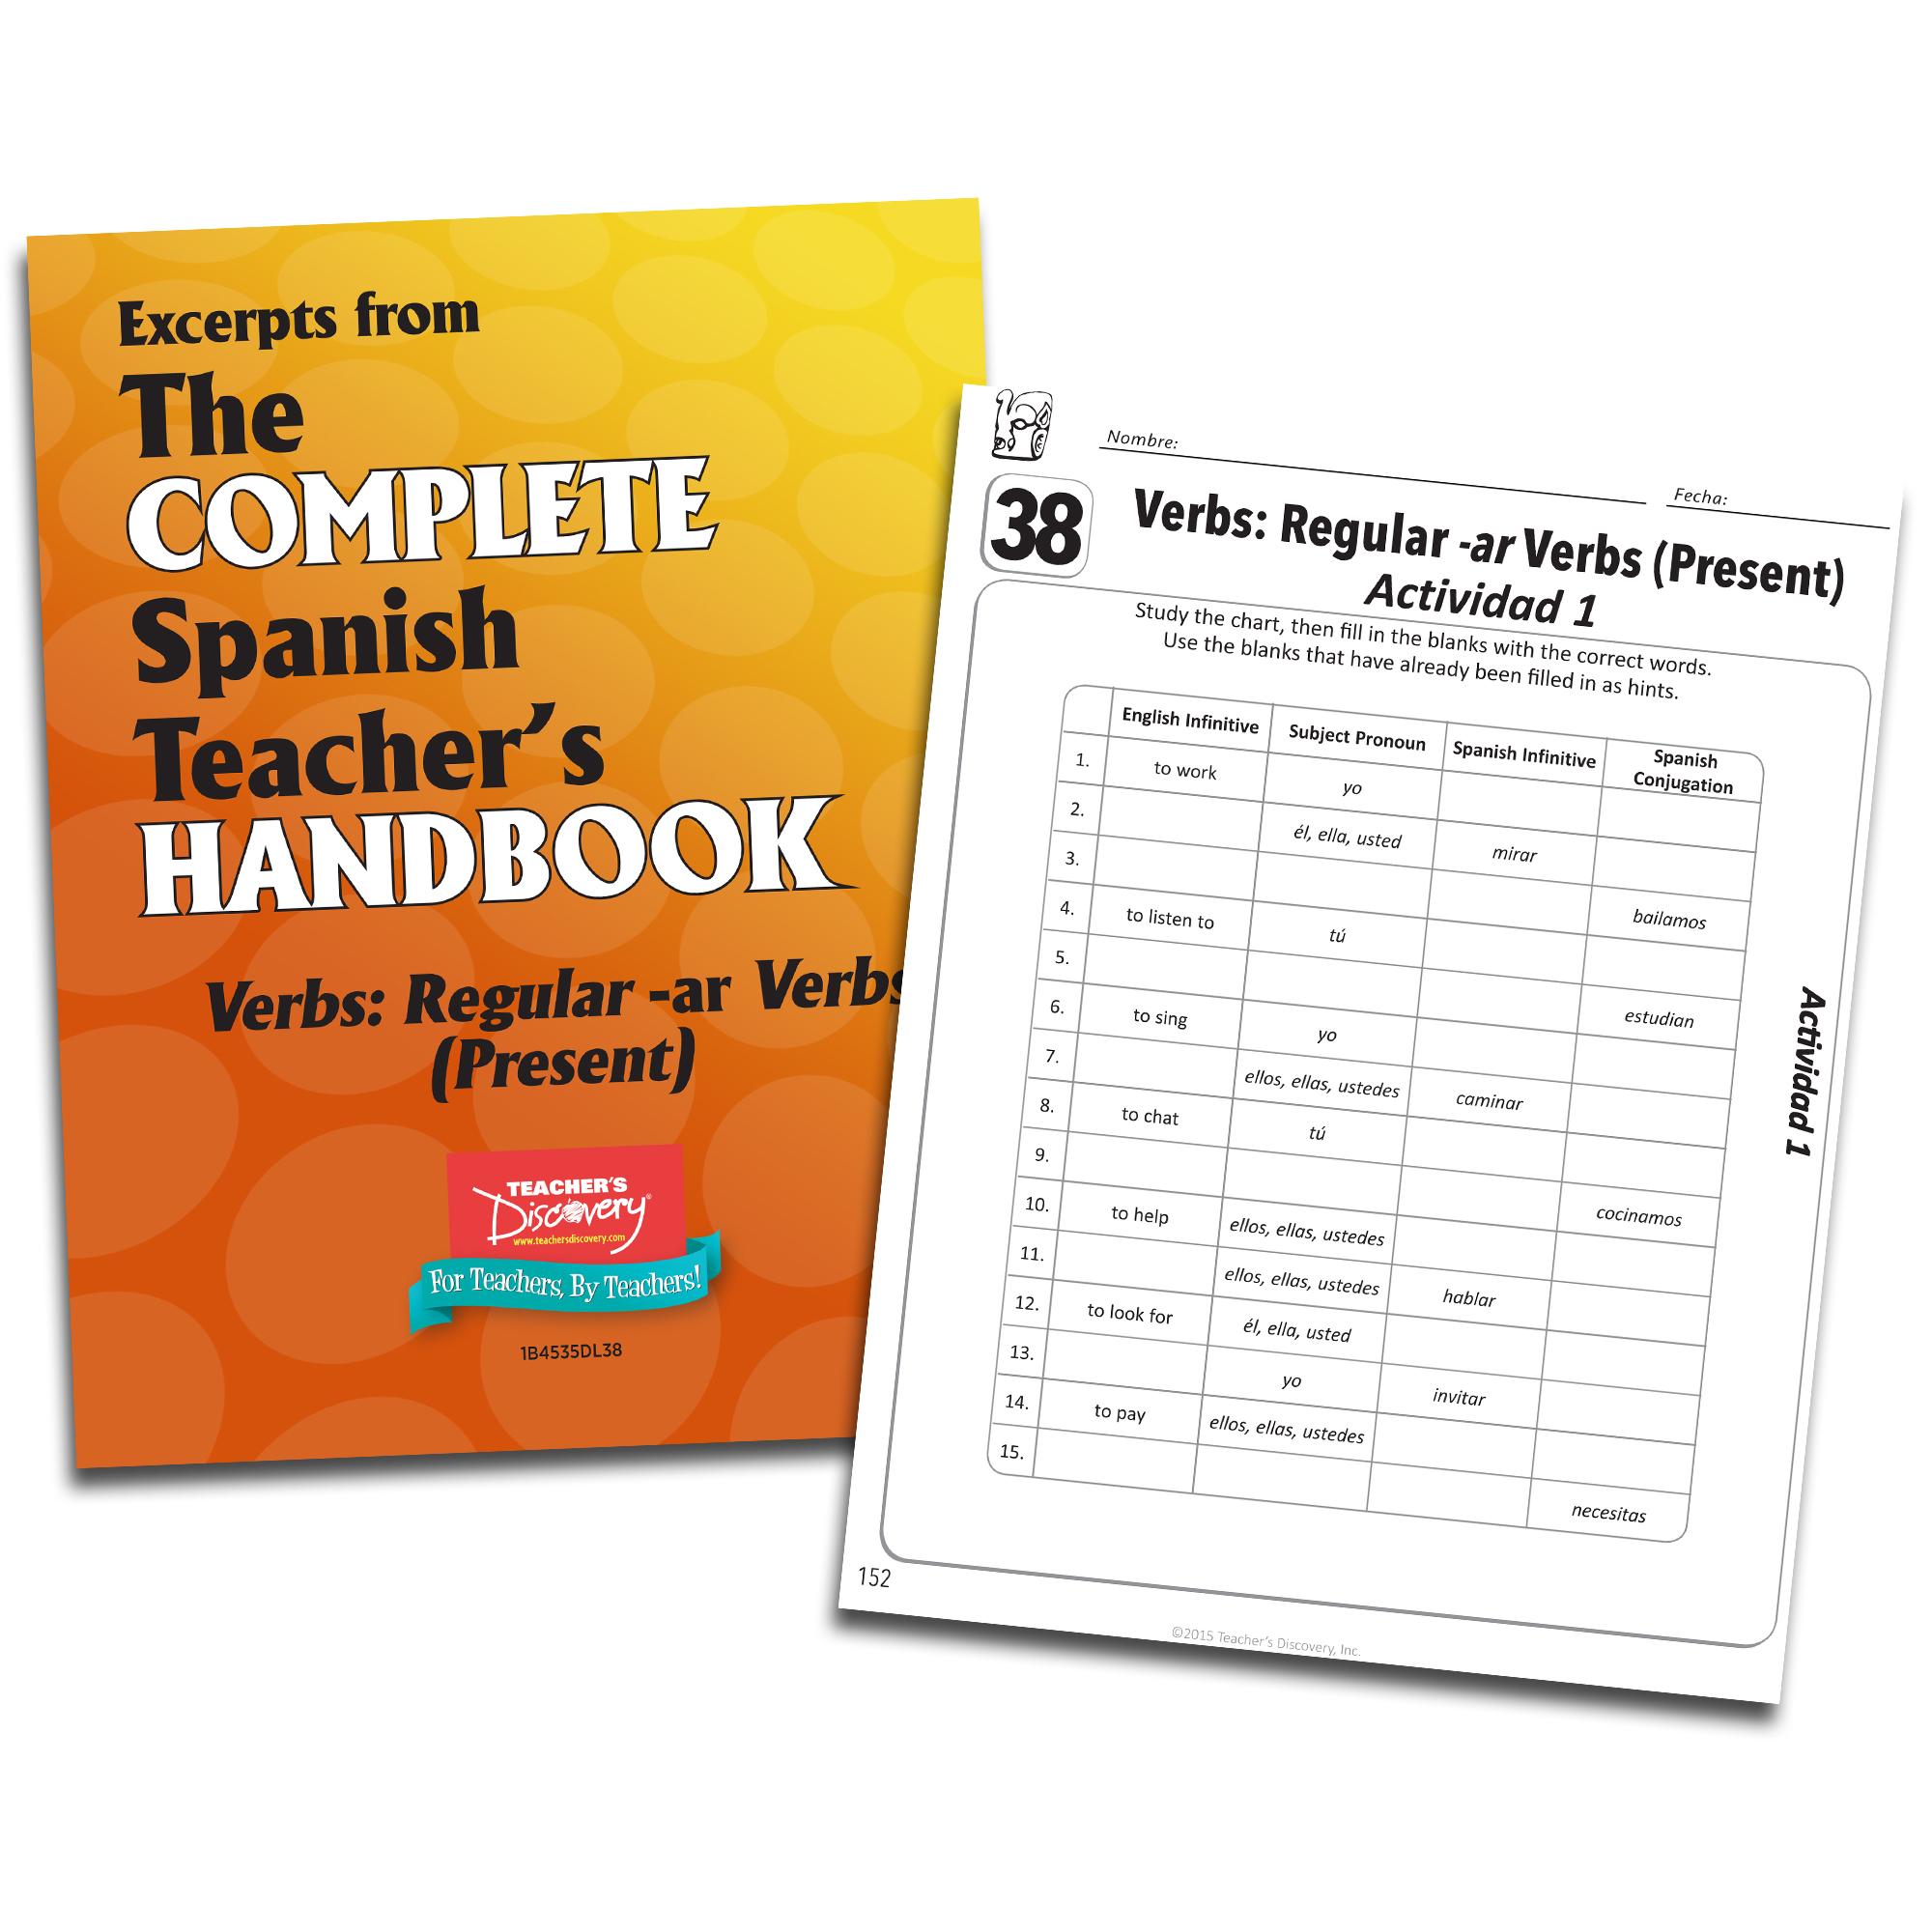 Verbs: Regular -ar Verbs (Present) - Spanish - Book Excerpt Download